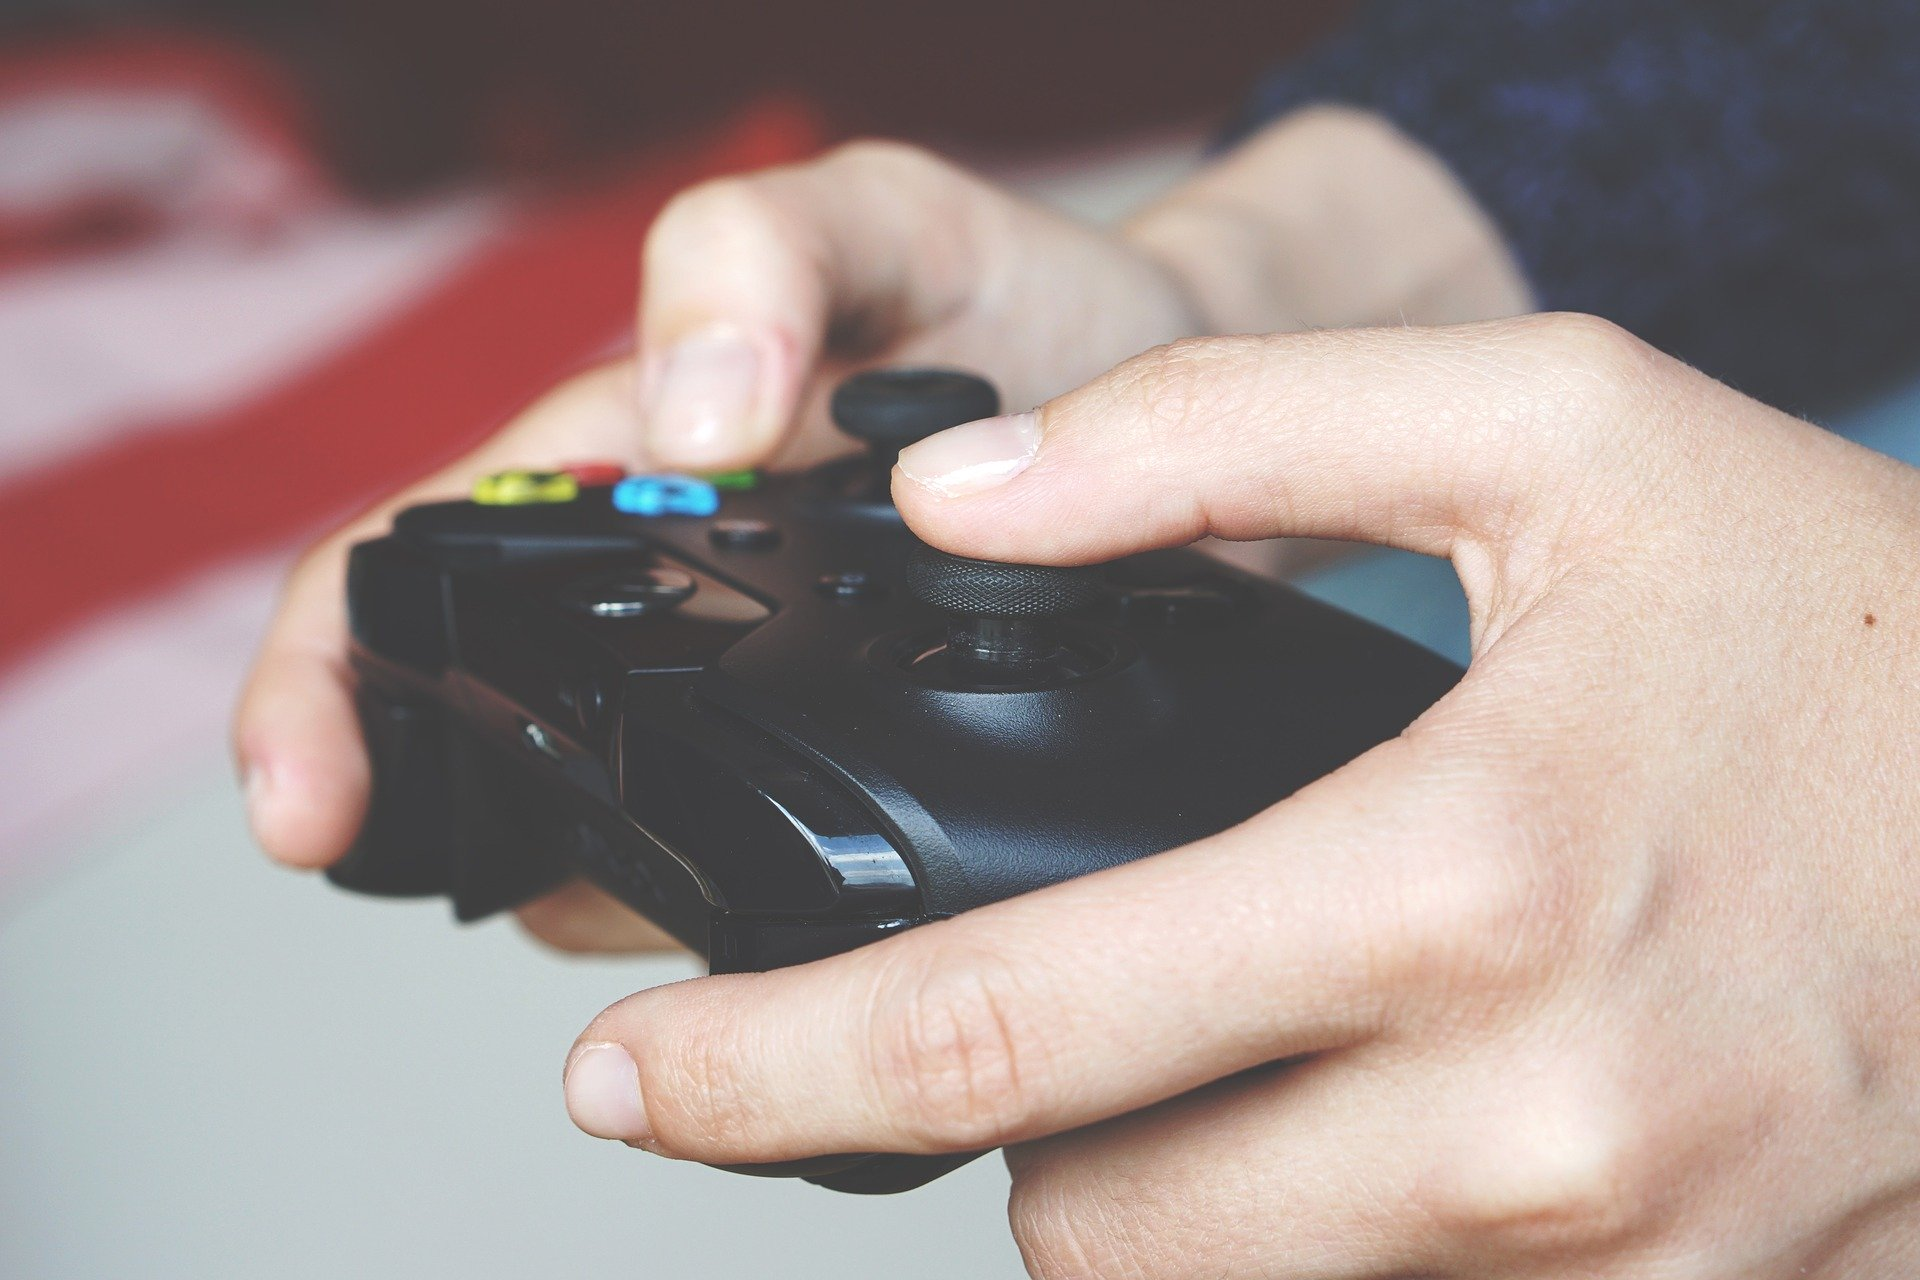 Homem joga videogame